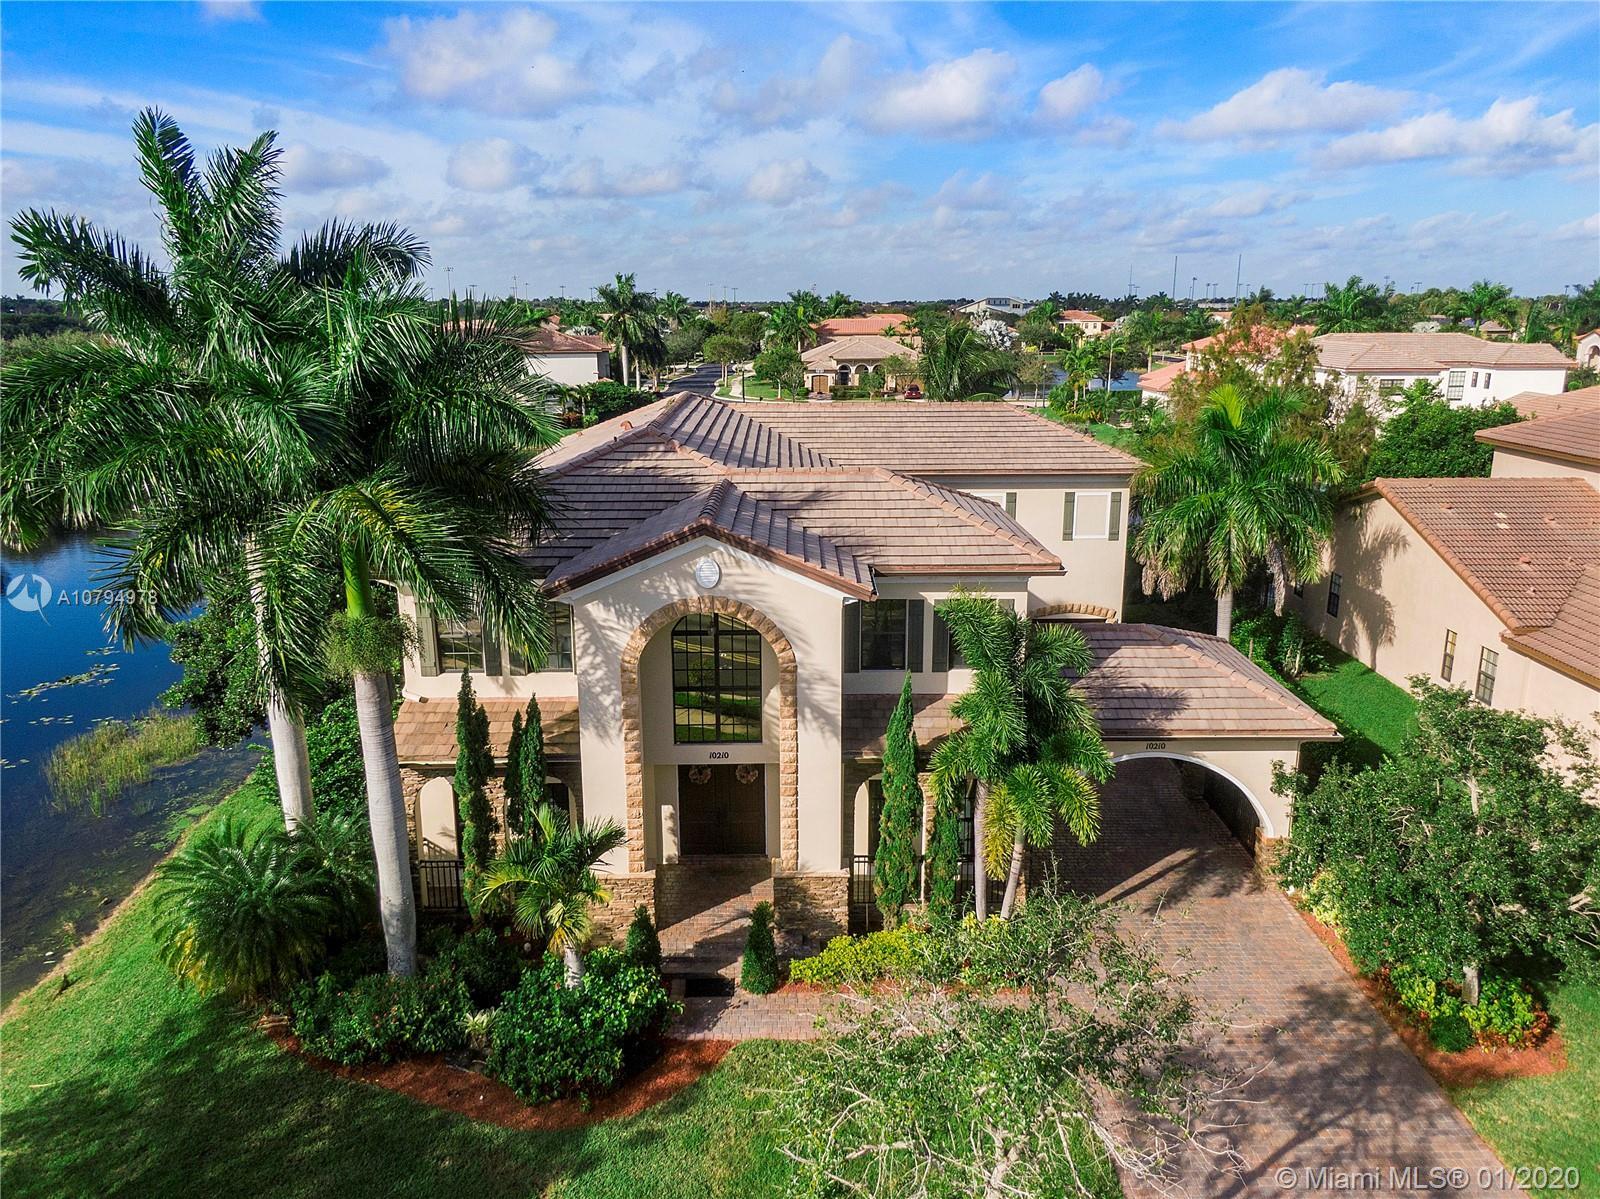 10210 NW Majestic Trl - Parkland, Florida